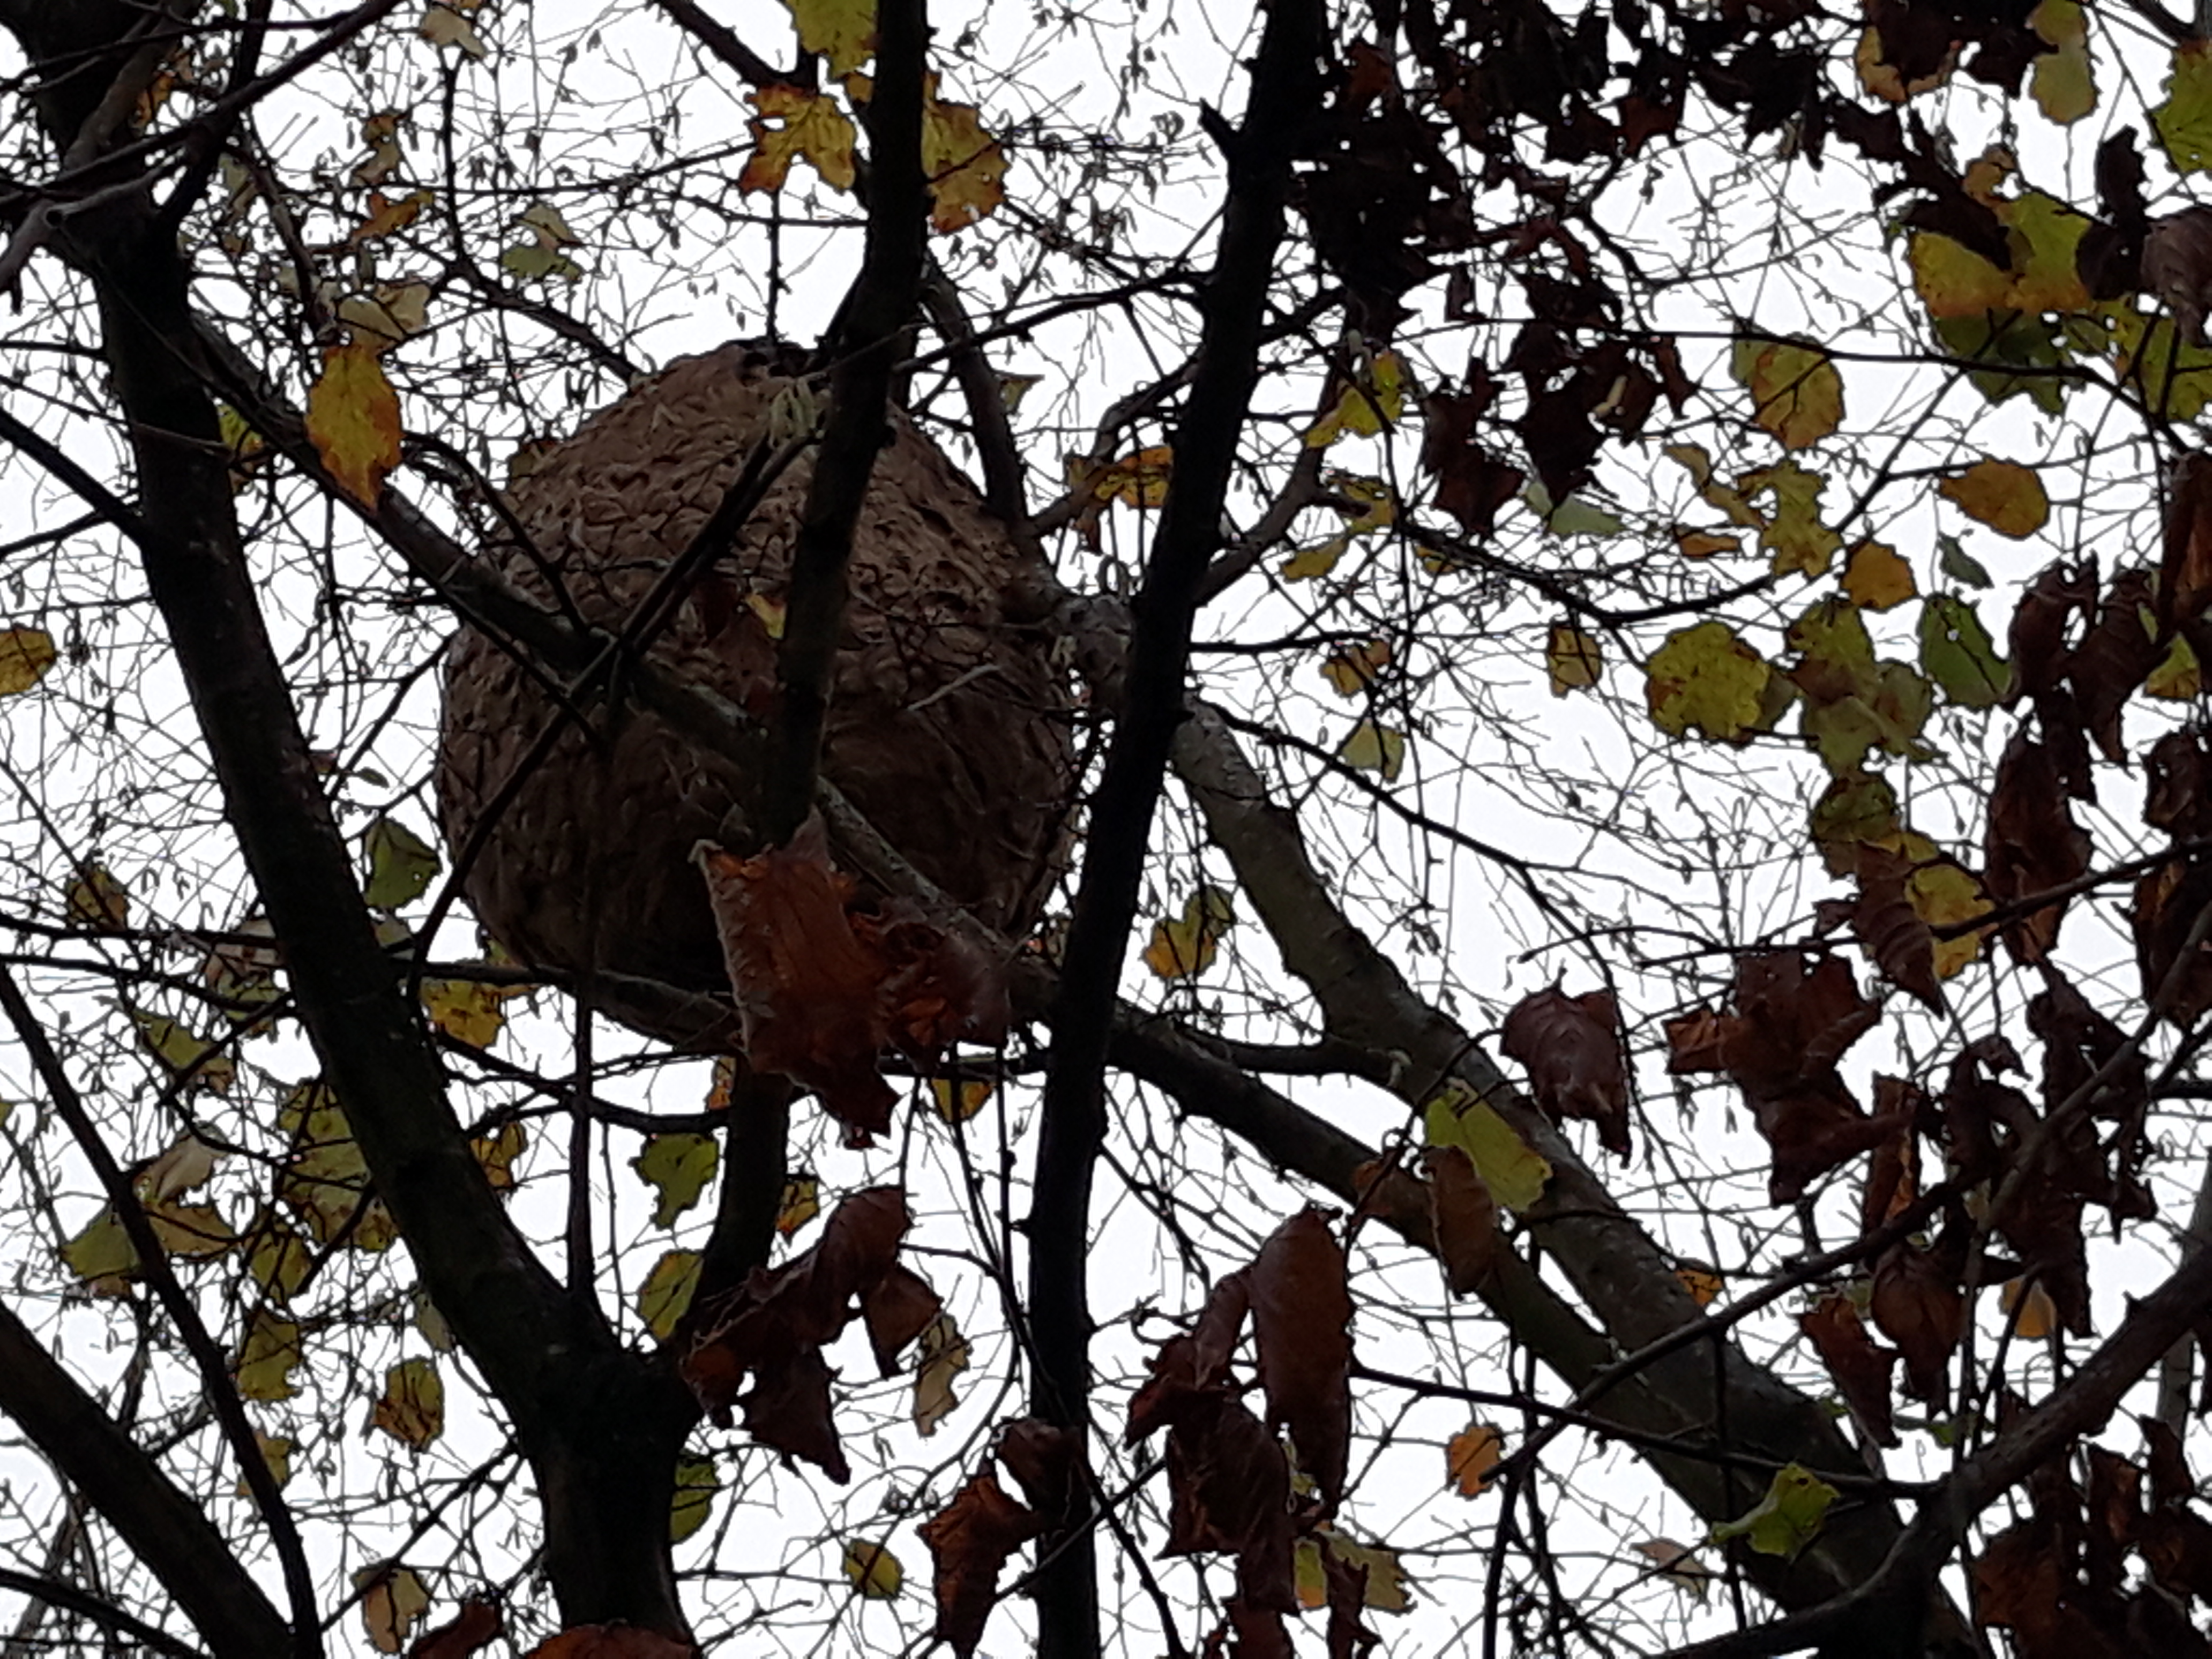 Destruction nid de guêpes